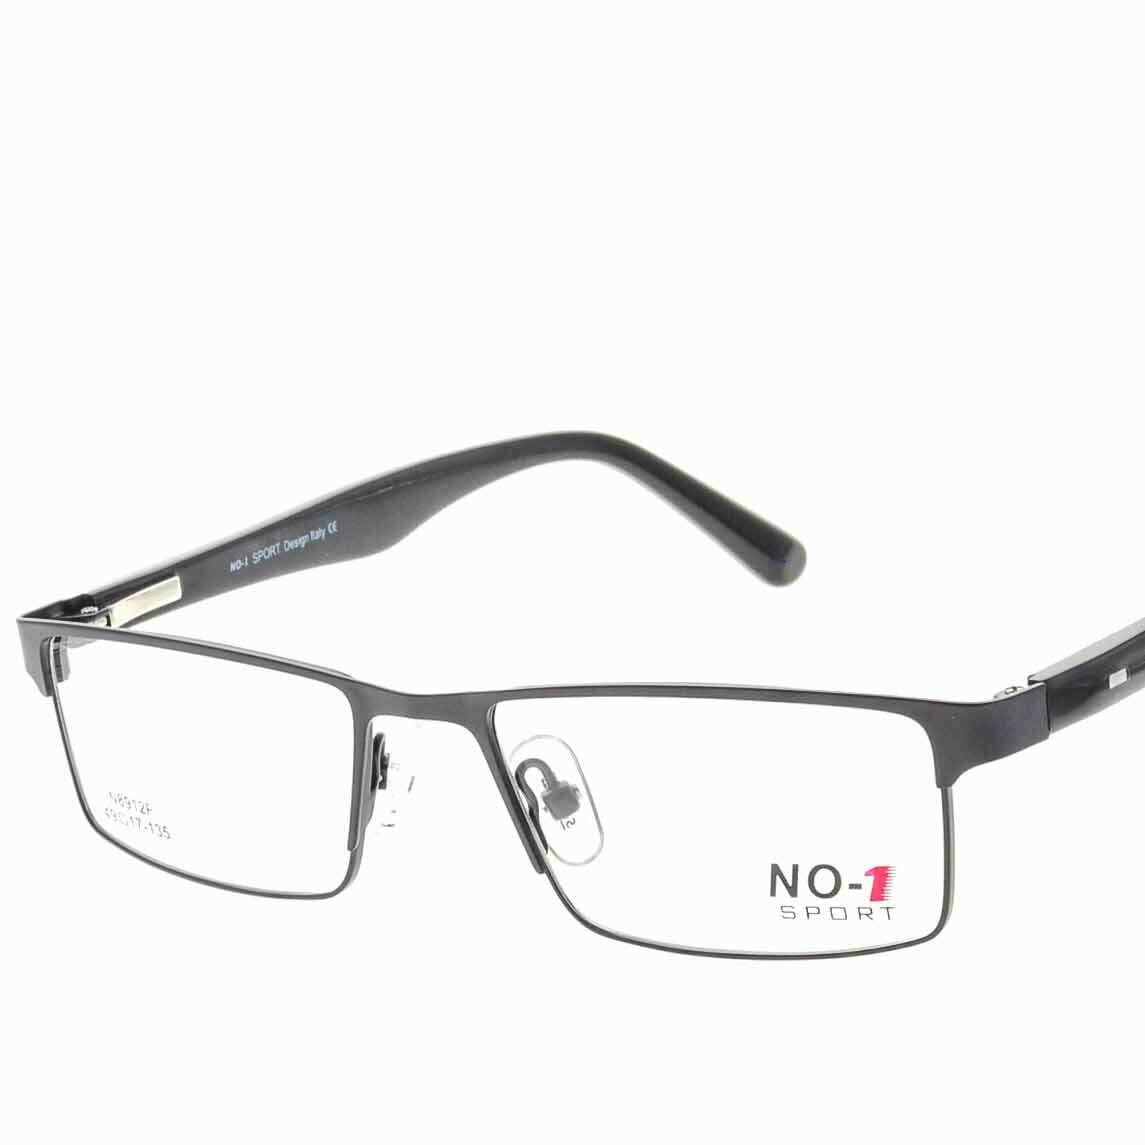 No-1 Sport N8912f